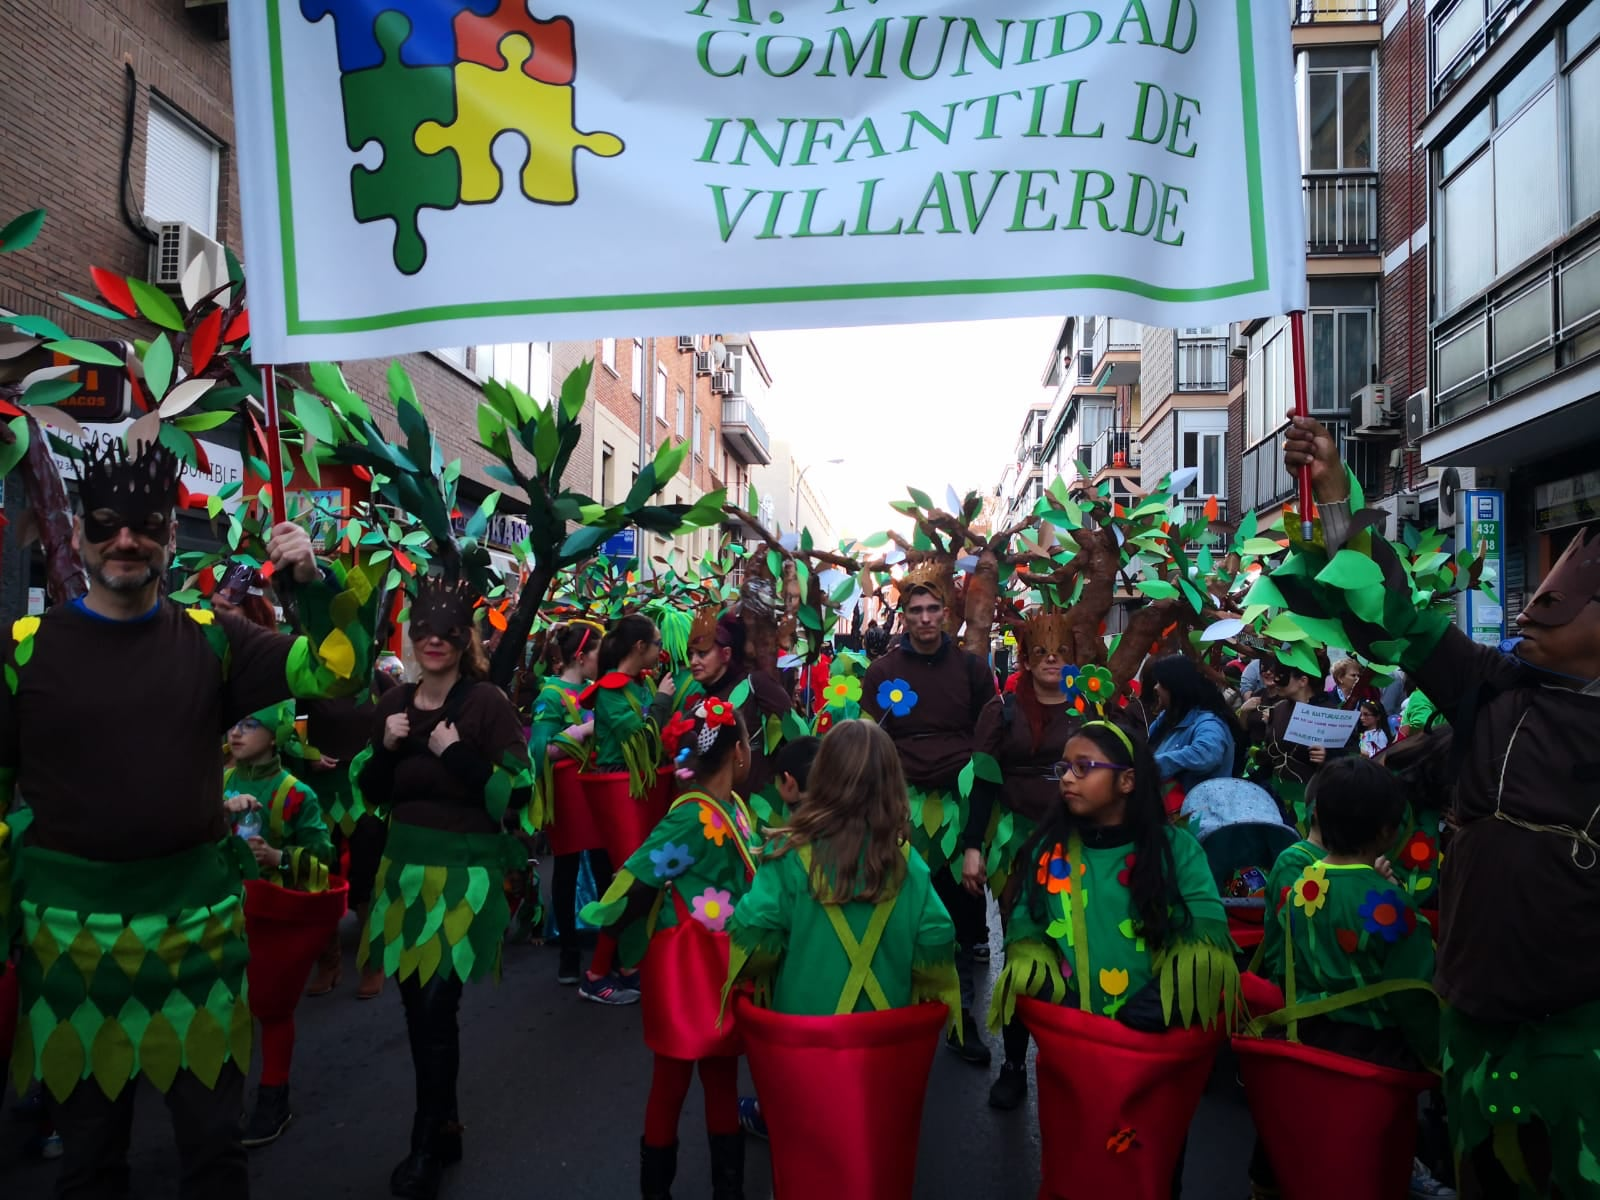 Logo COMUNIDAD INFANTIL DE VILLAVERDE